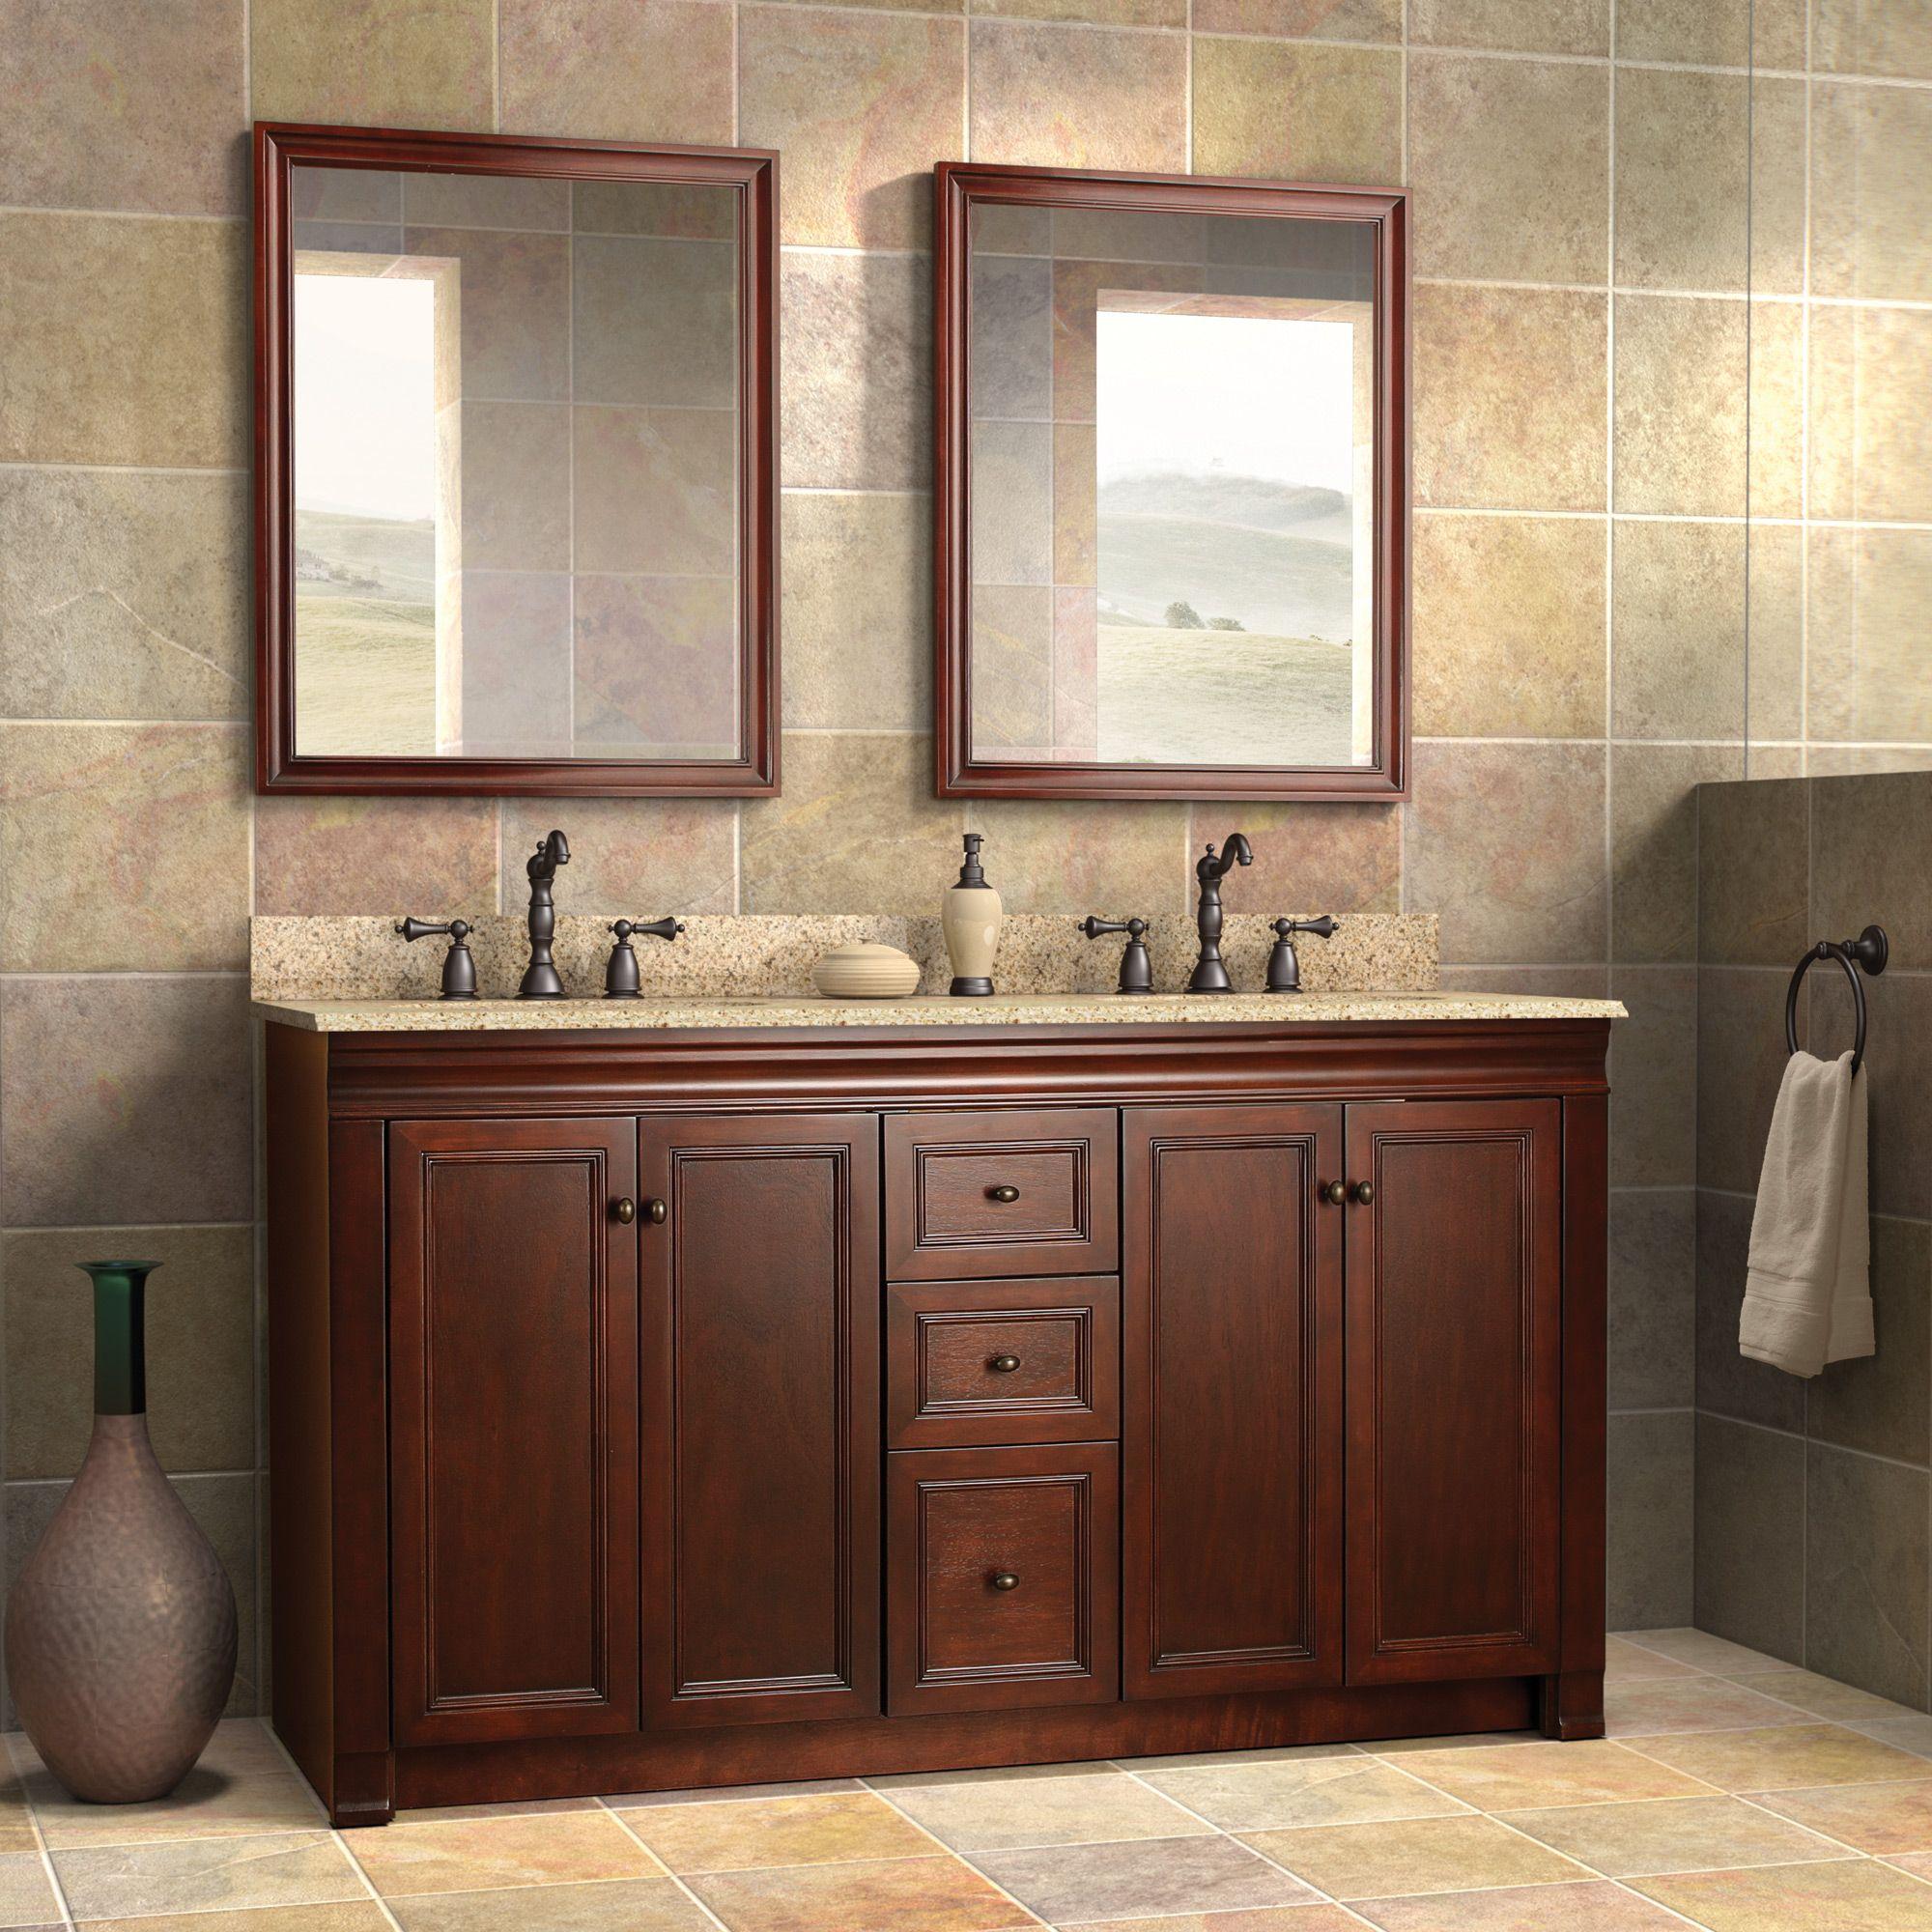 5 Best Double Sink Bathroom Vanity Ideas 2019 Bathroom Vanities